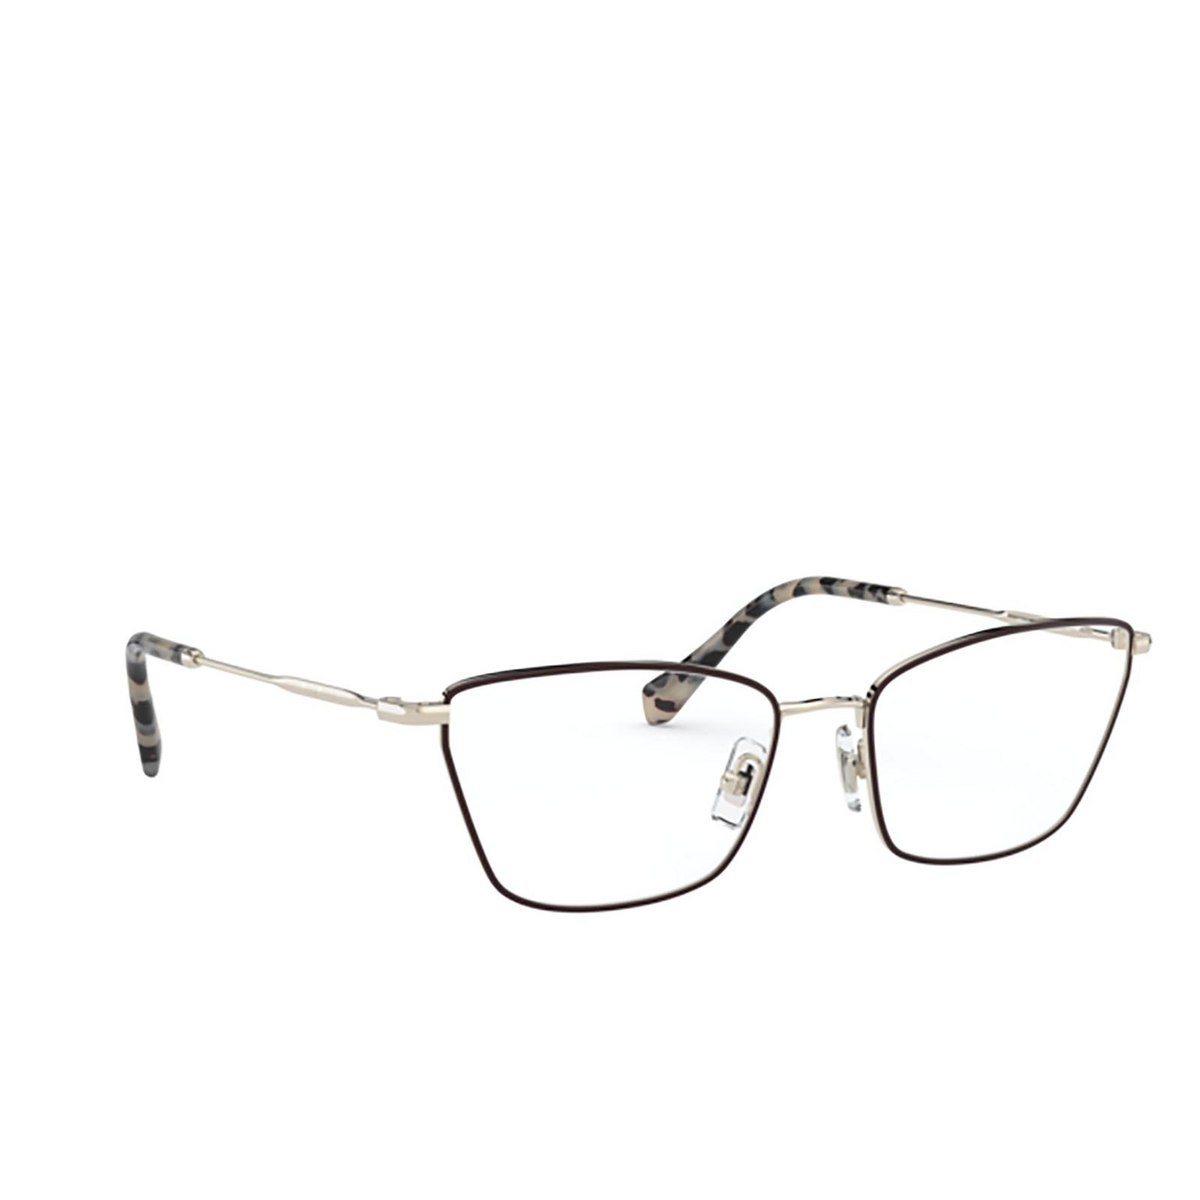 Miu Miu® Cat-eye Eyeglasses: MU 52SV color Pale Gold / Bordeaux 09B1O1 - three-quarters view.